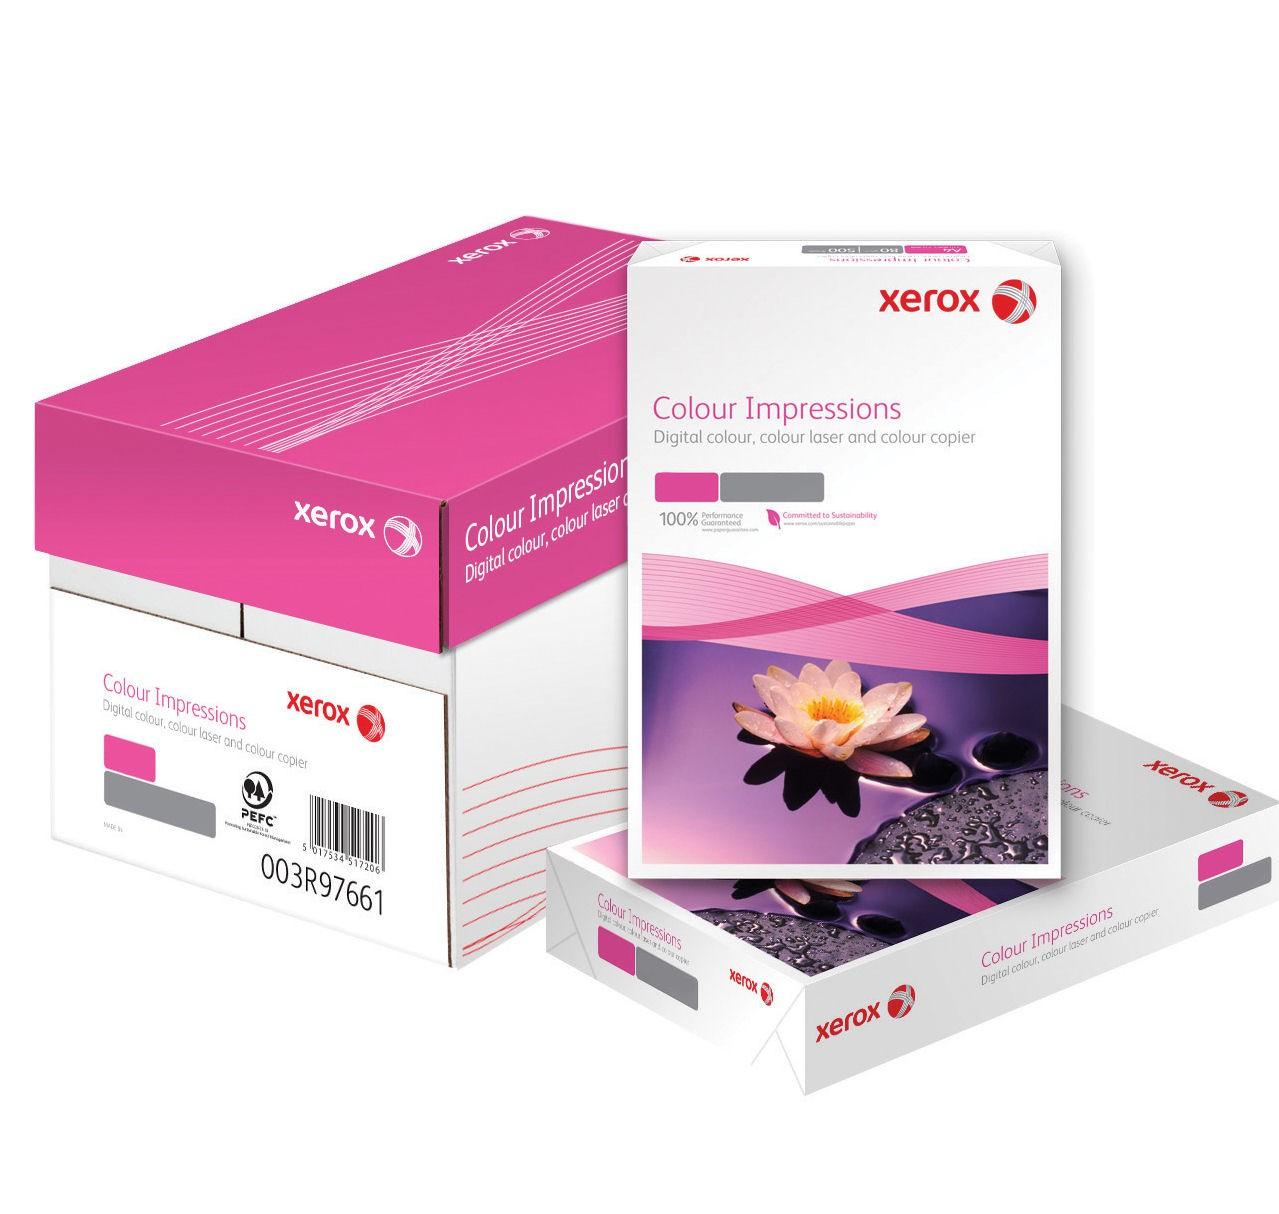 Xerox Colour Impressions A4 210X297mm PEFC 100Gm2 LG Pack 500 003R97666